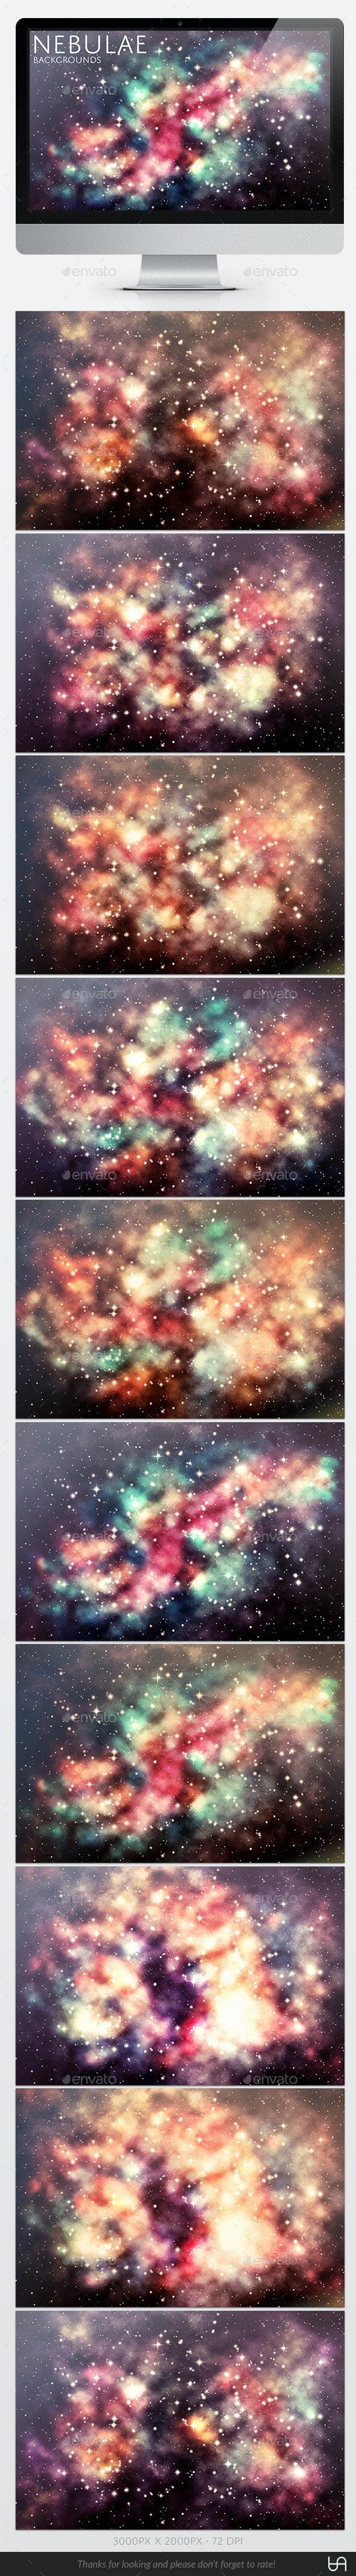 10 Nebulae Backgrounds - Backgrounds Graphics